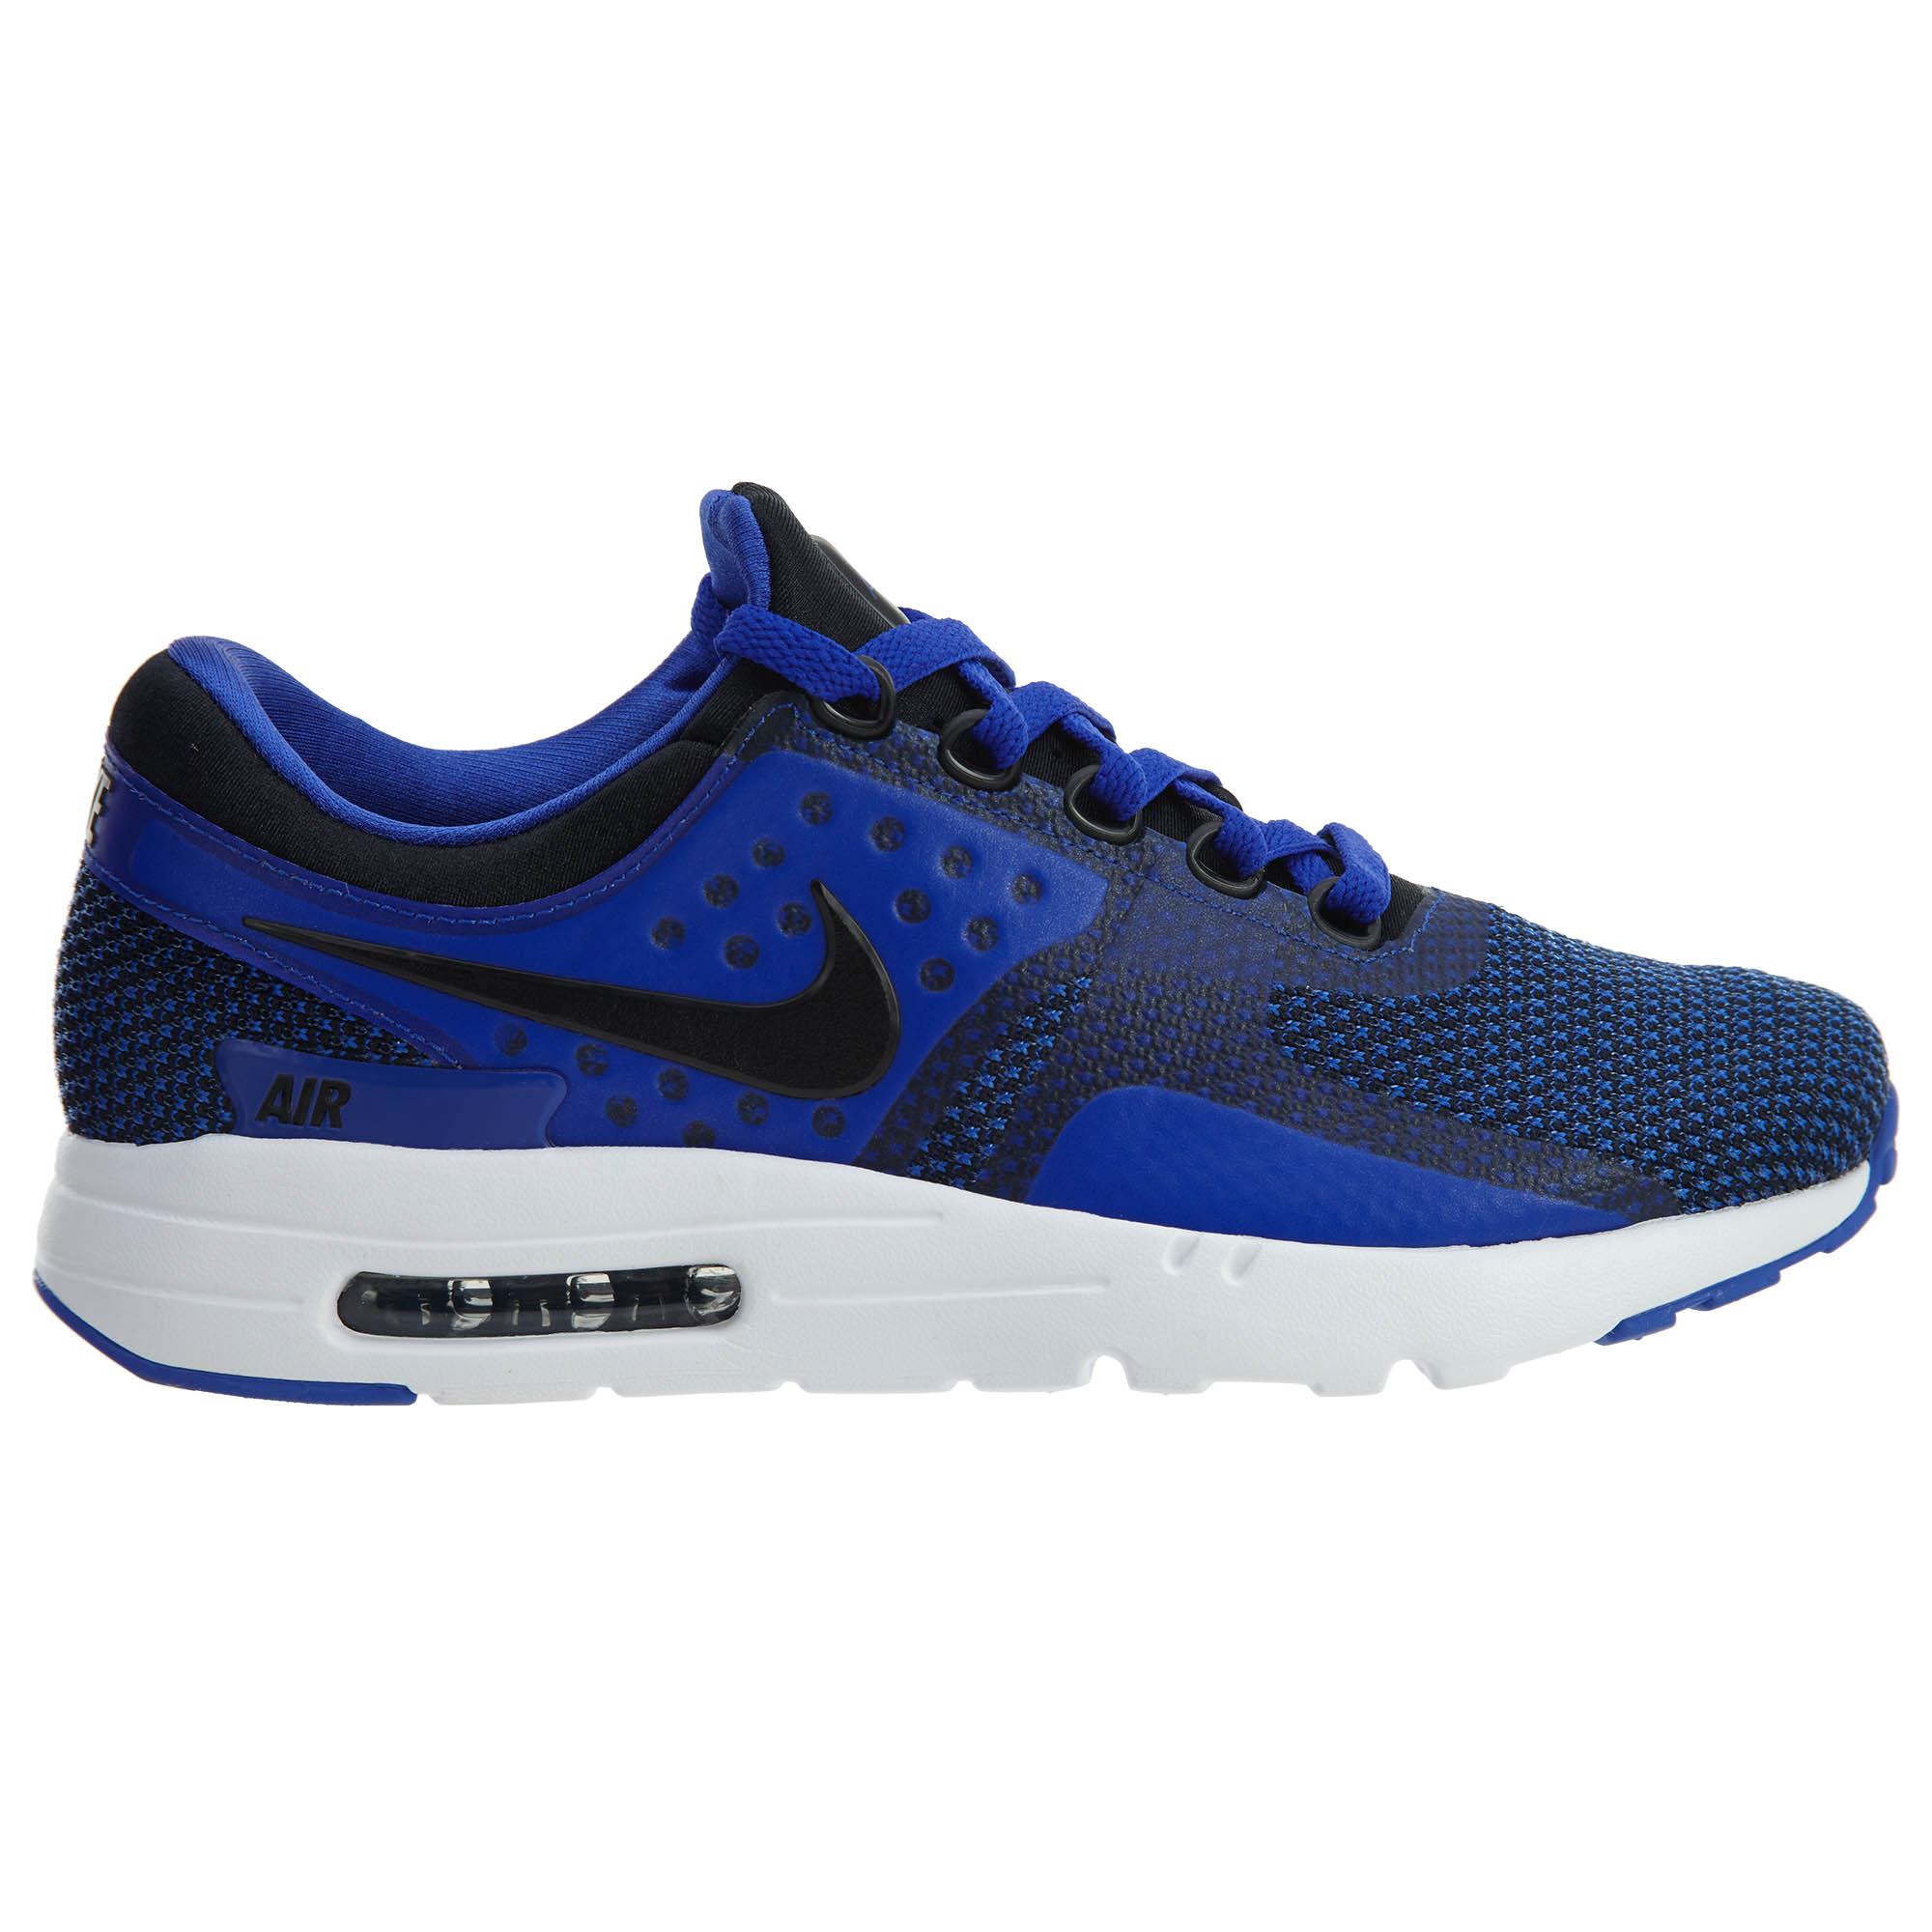 Nike Air Max Zero Essential Black/Black/Paramount Blue